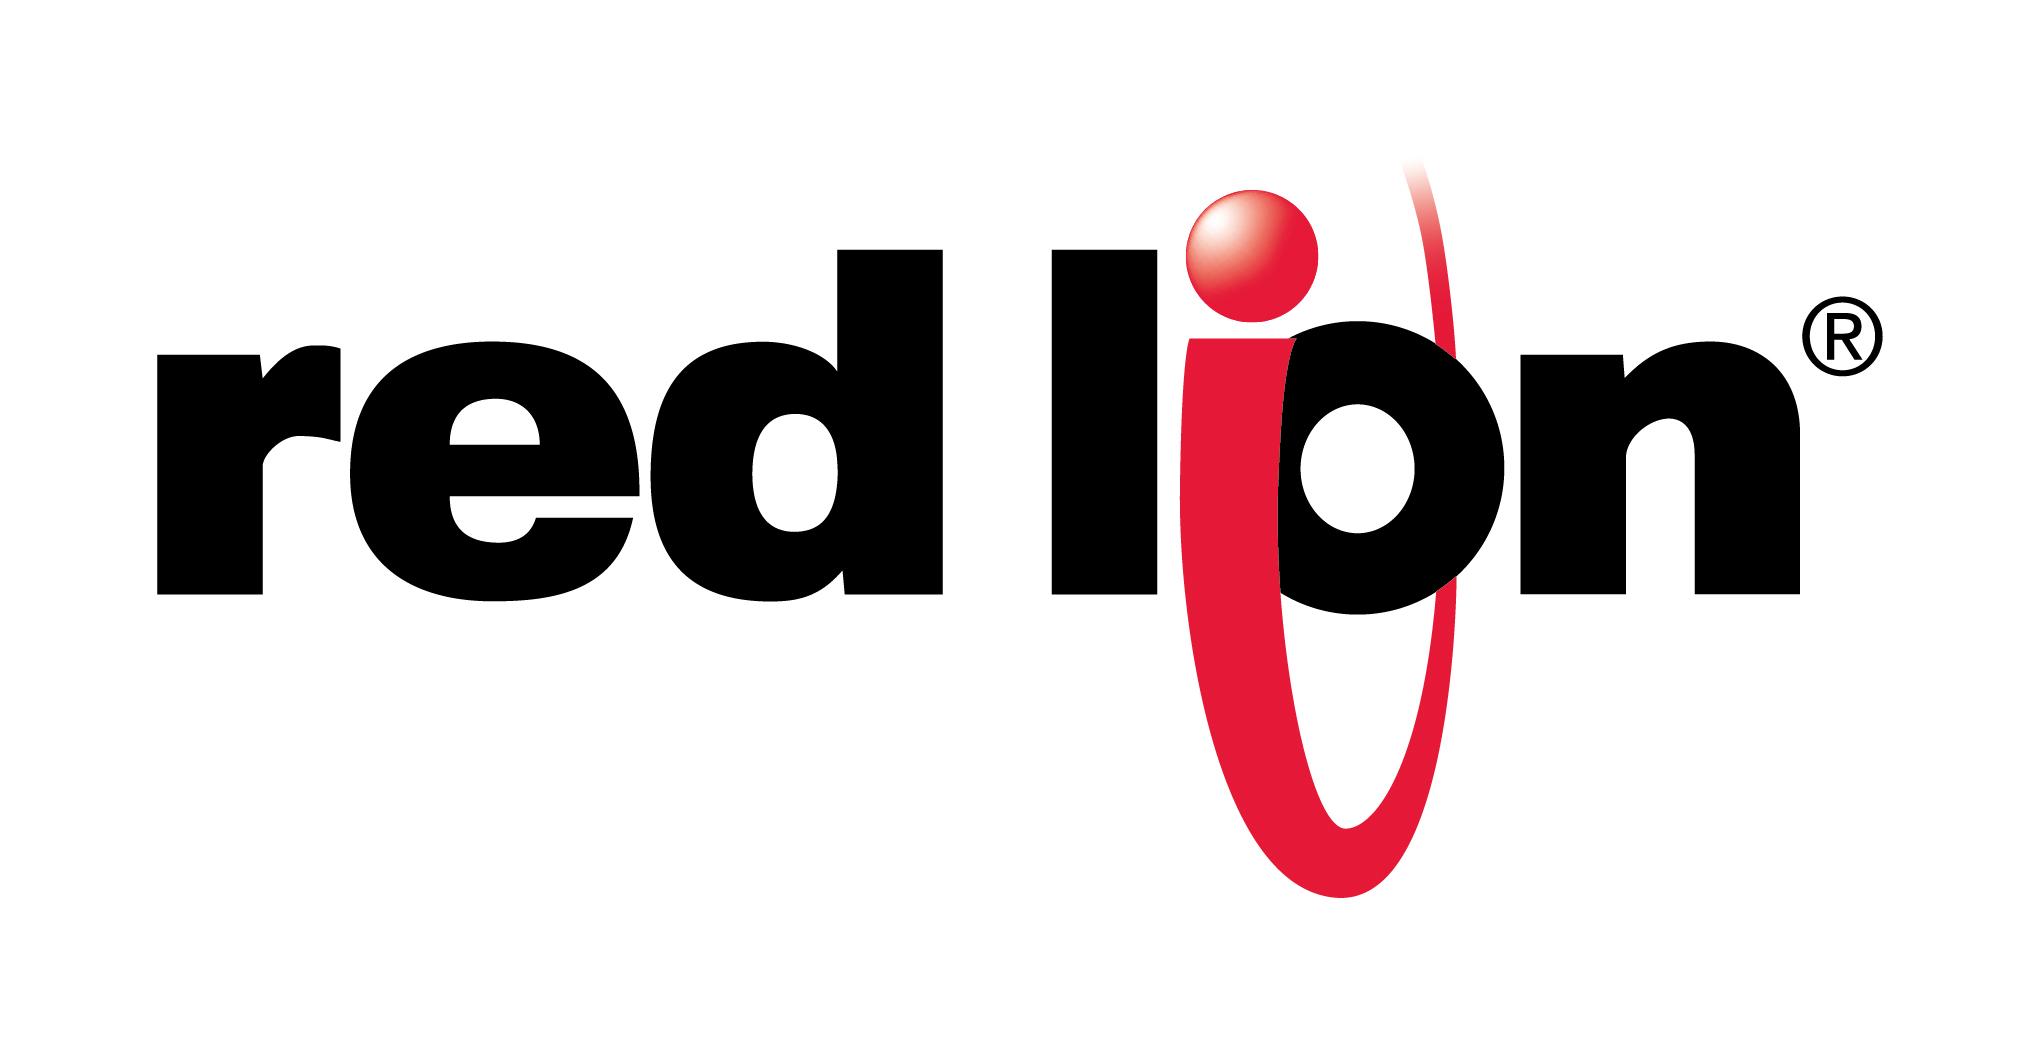 美国红狮控制公司(Red Lion Controls)